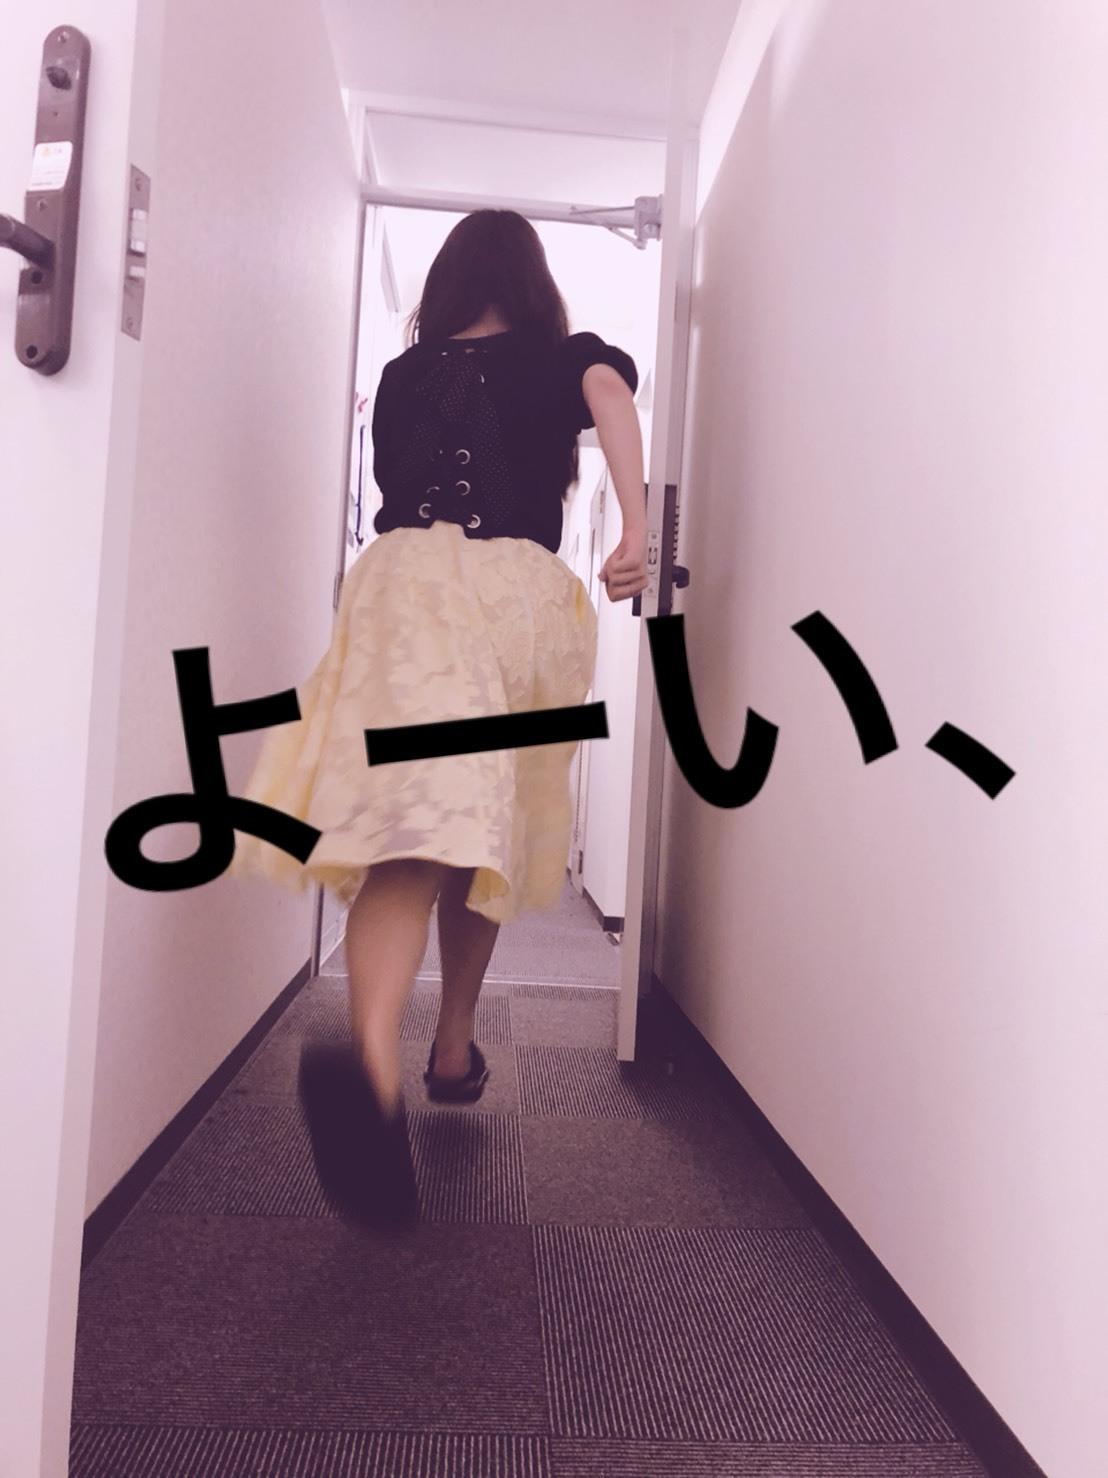 S__17113094.jpg